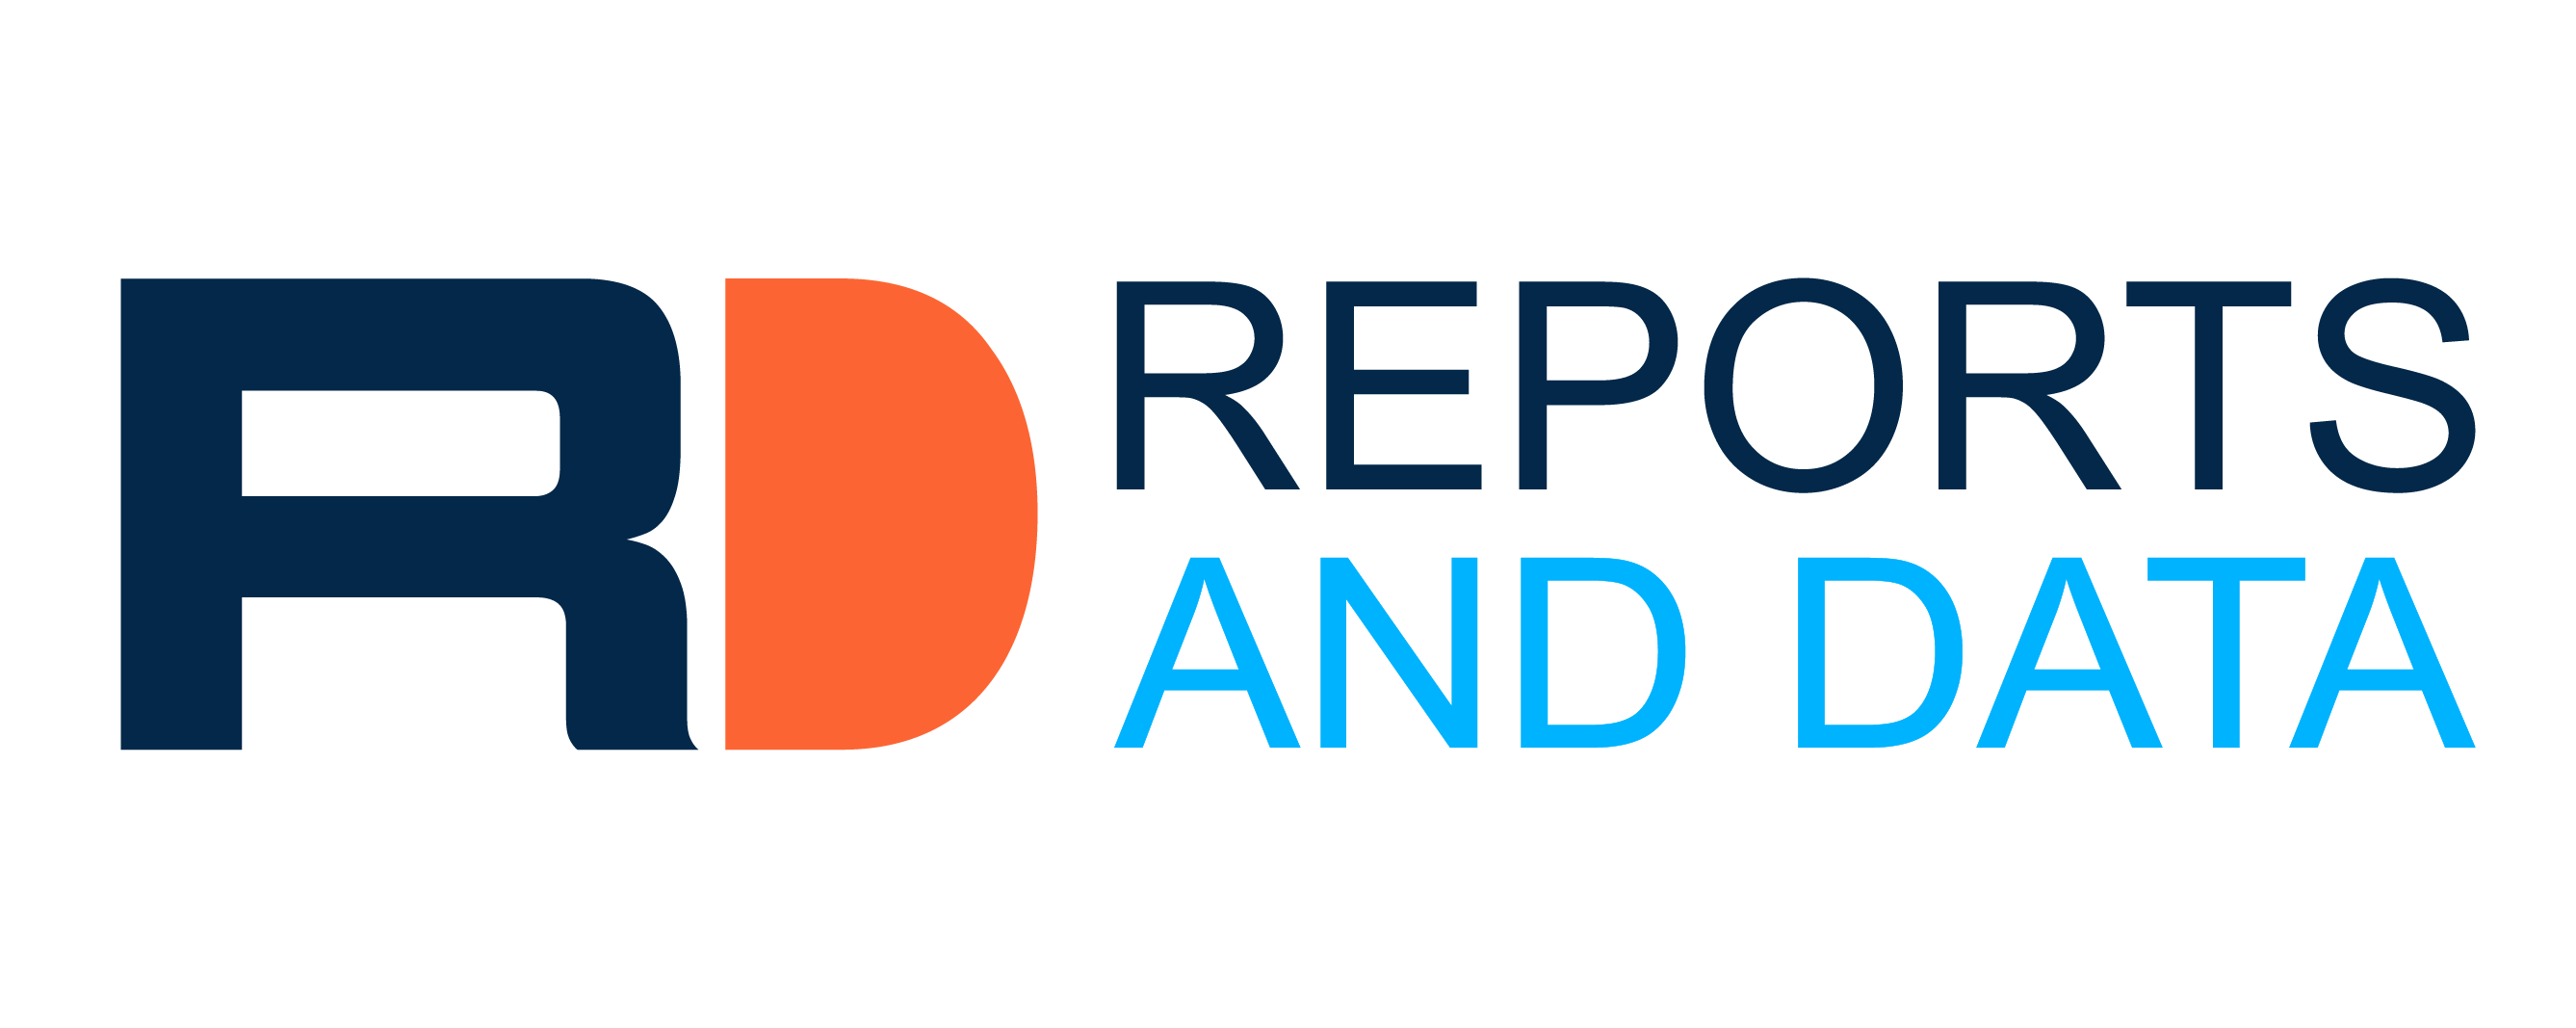 Global Acetaldehyde Market Insights, Size, Opportunities and Forecast by 2026: Top Vendors- BASF SE, CNPC, Showa Denko K.K., Merck KGaA, Celanese Corporation